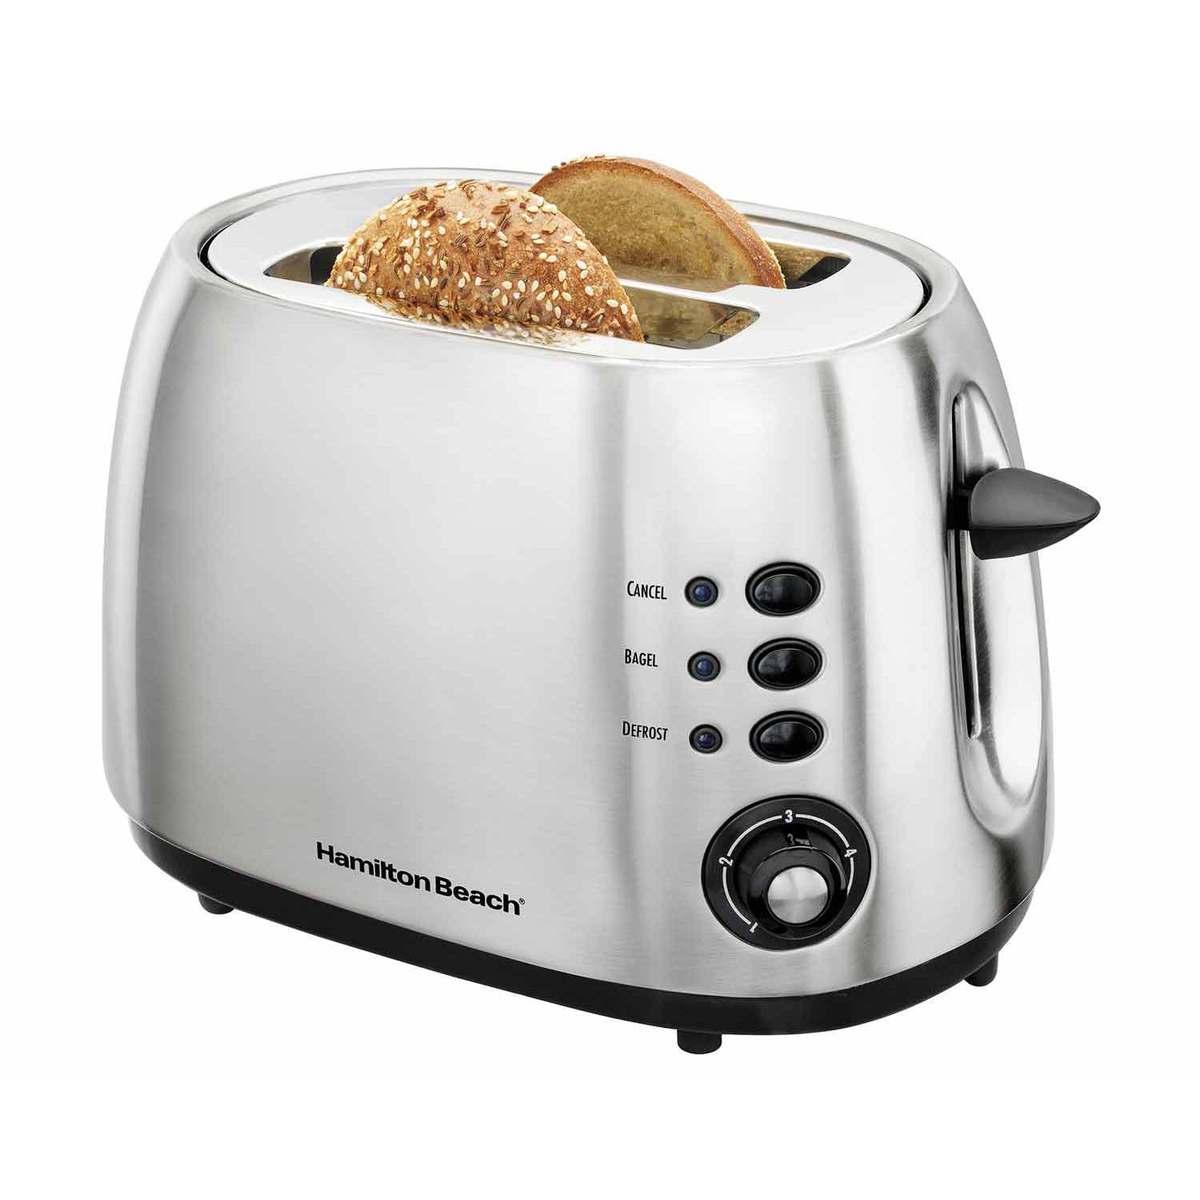 2 Slice Toaster (22504)